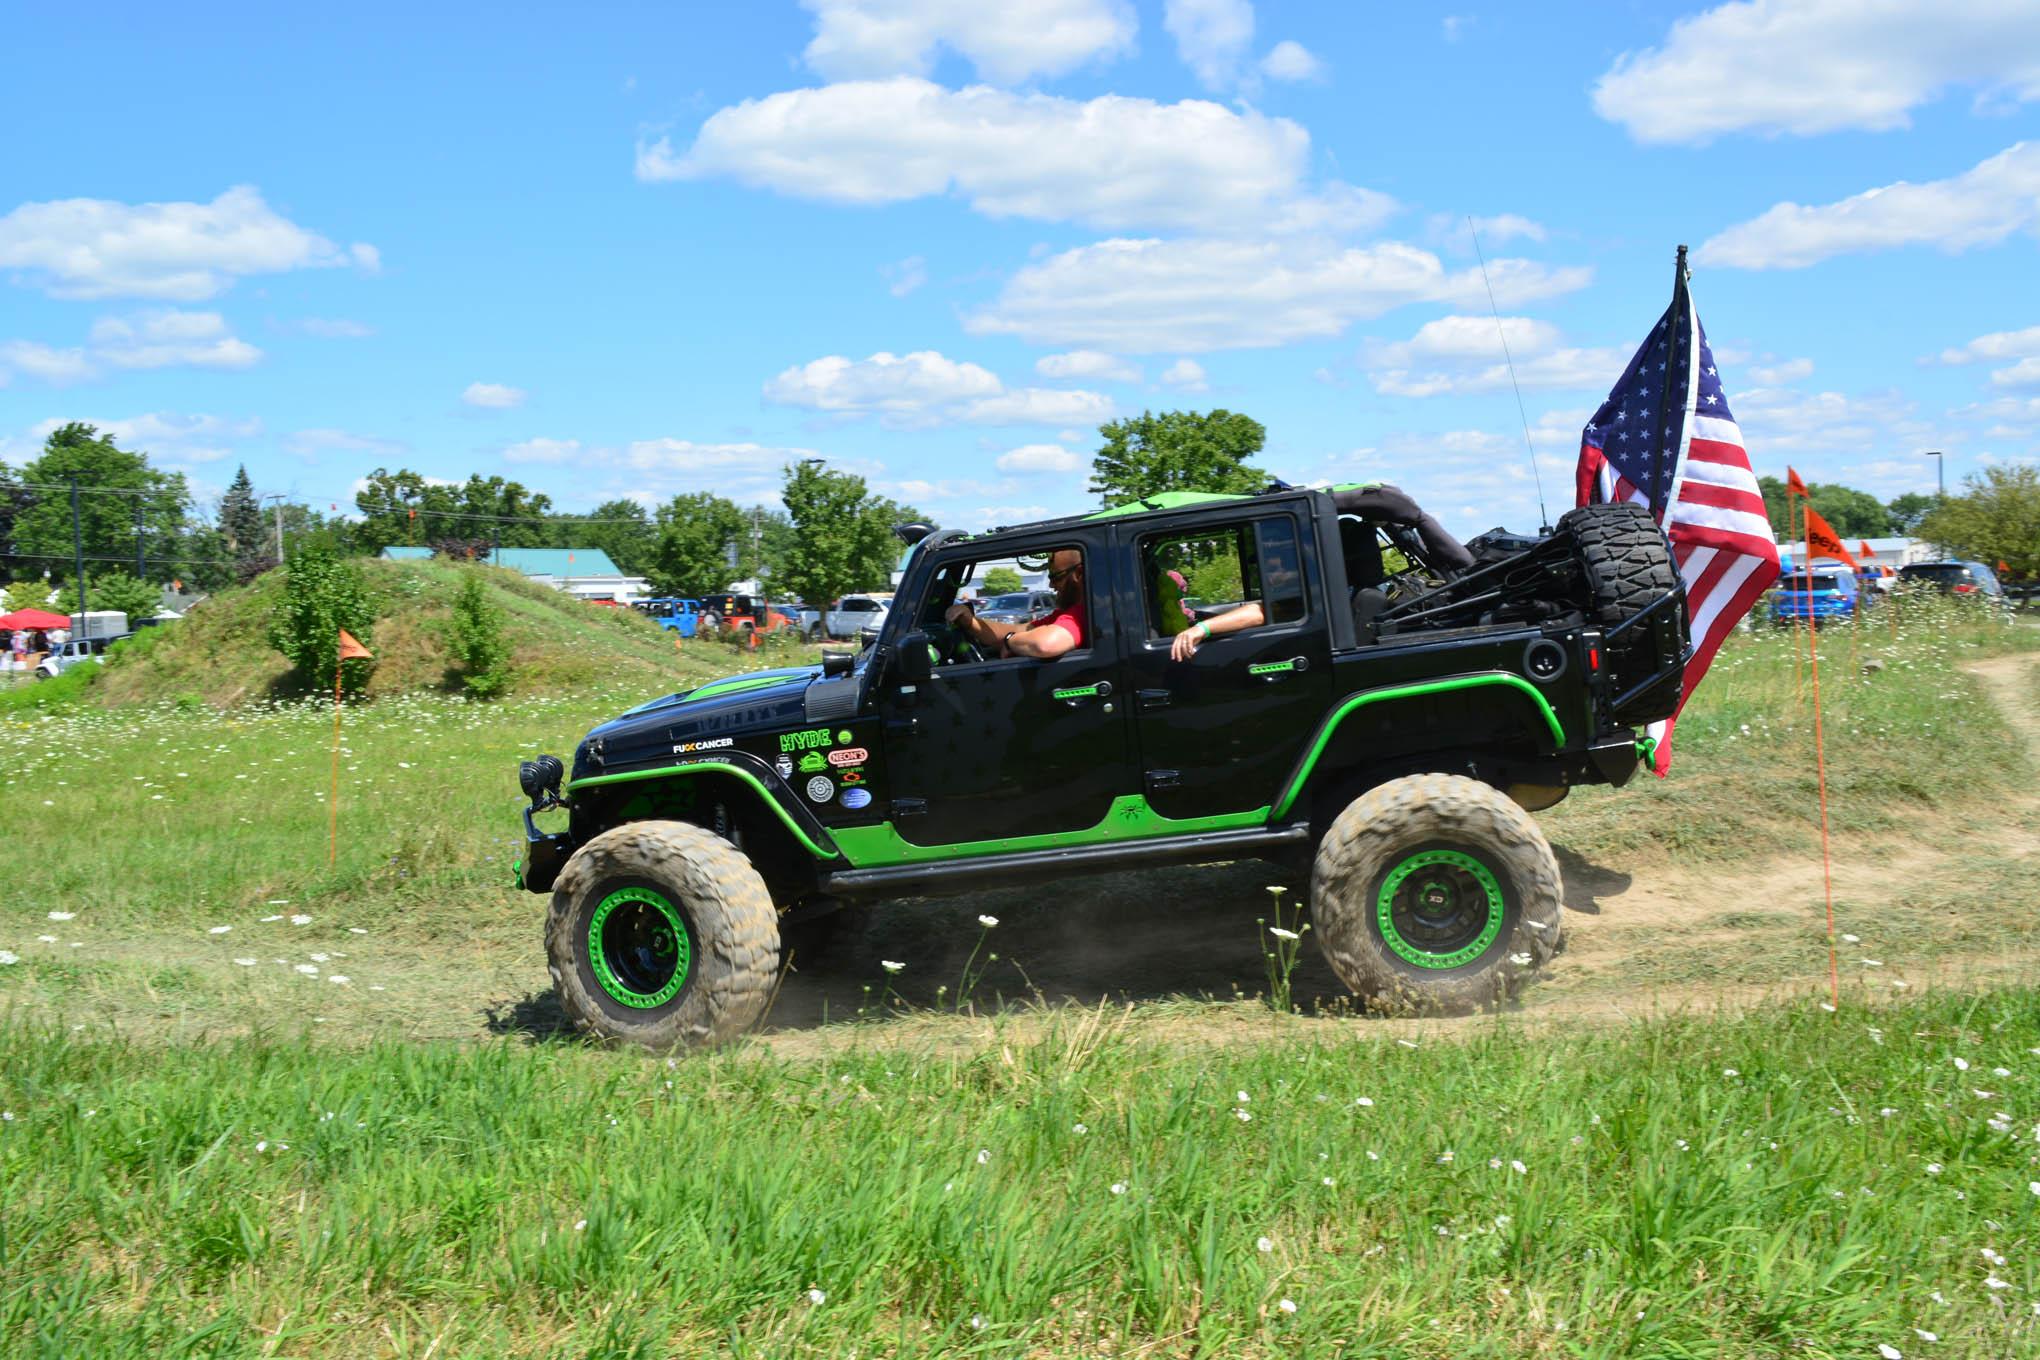 091 toledo jeep fest gallery